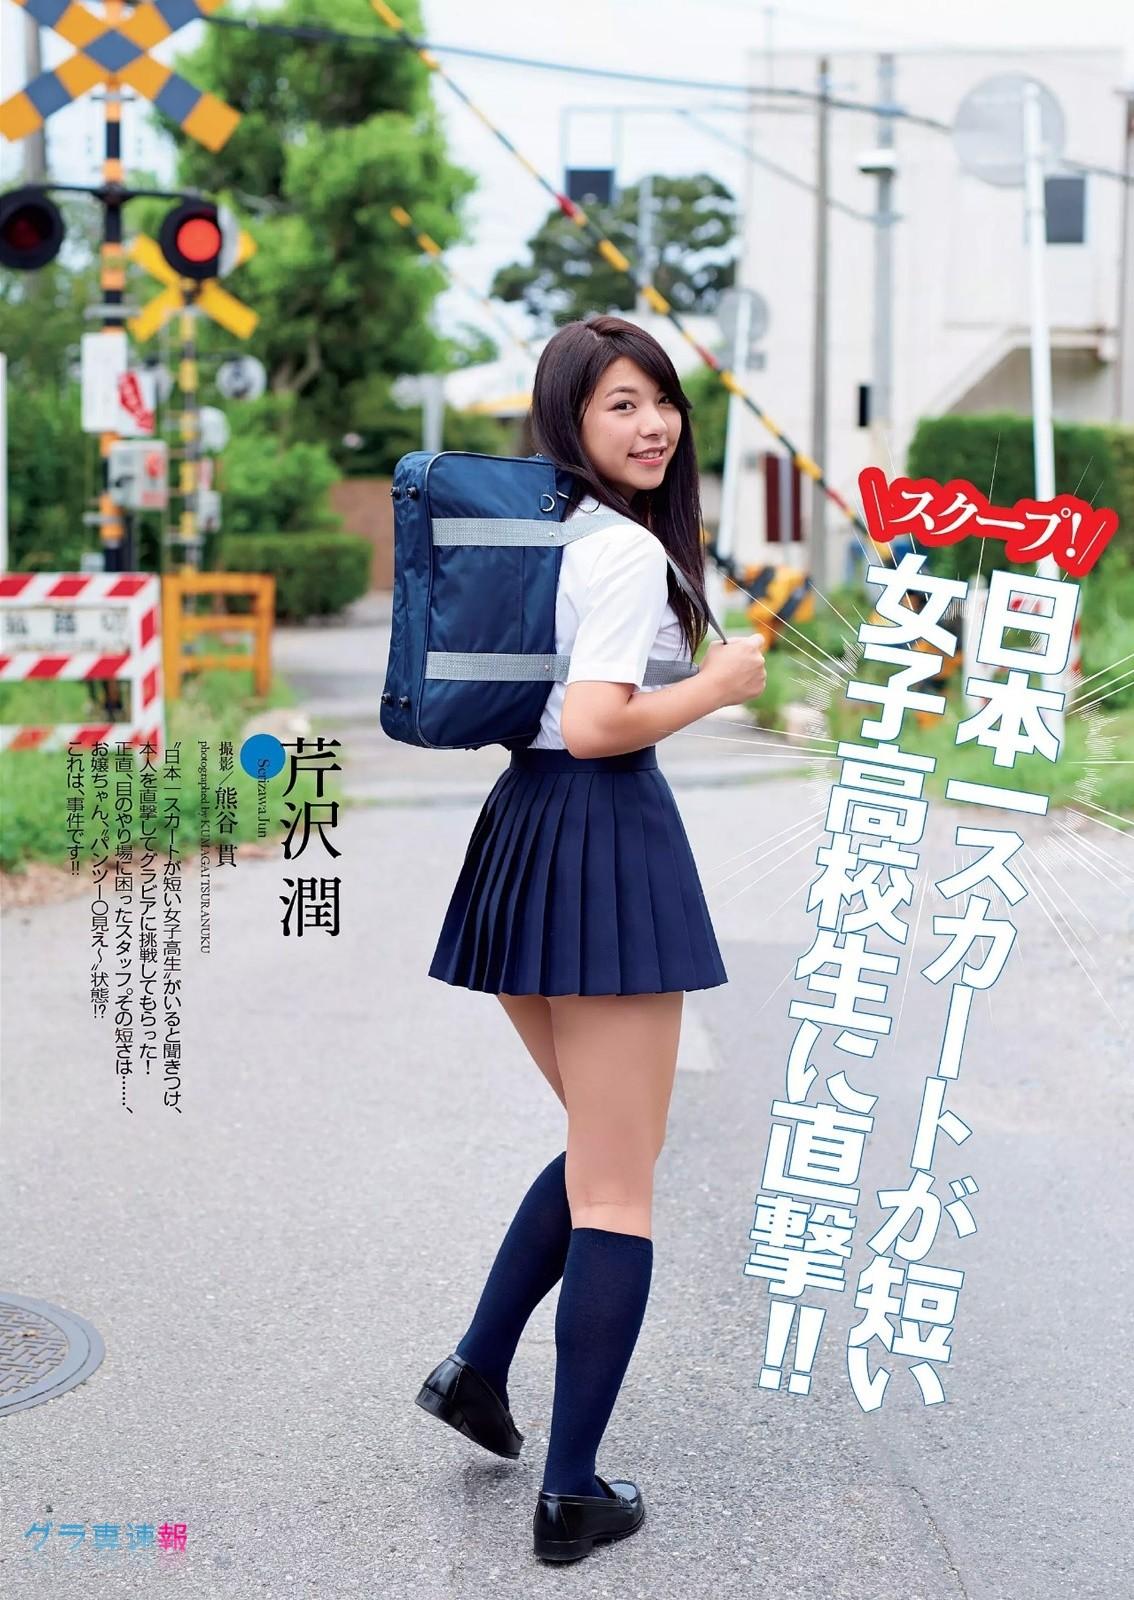 serizawa_jun075.jpg